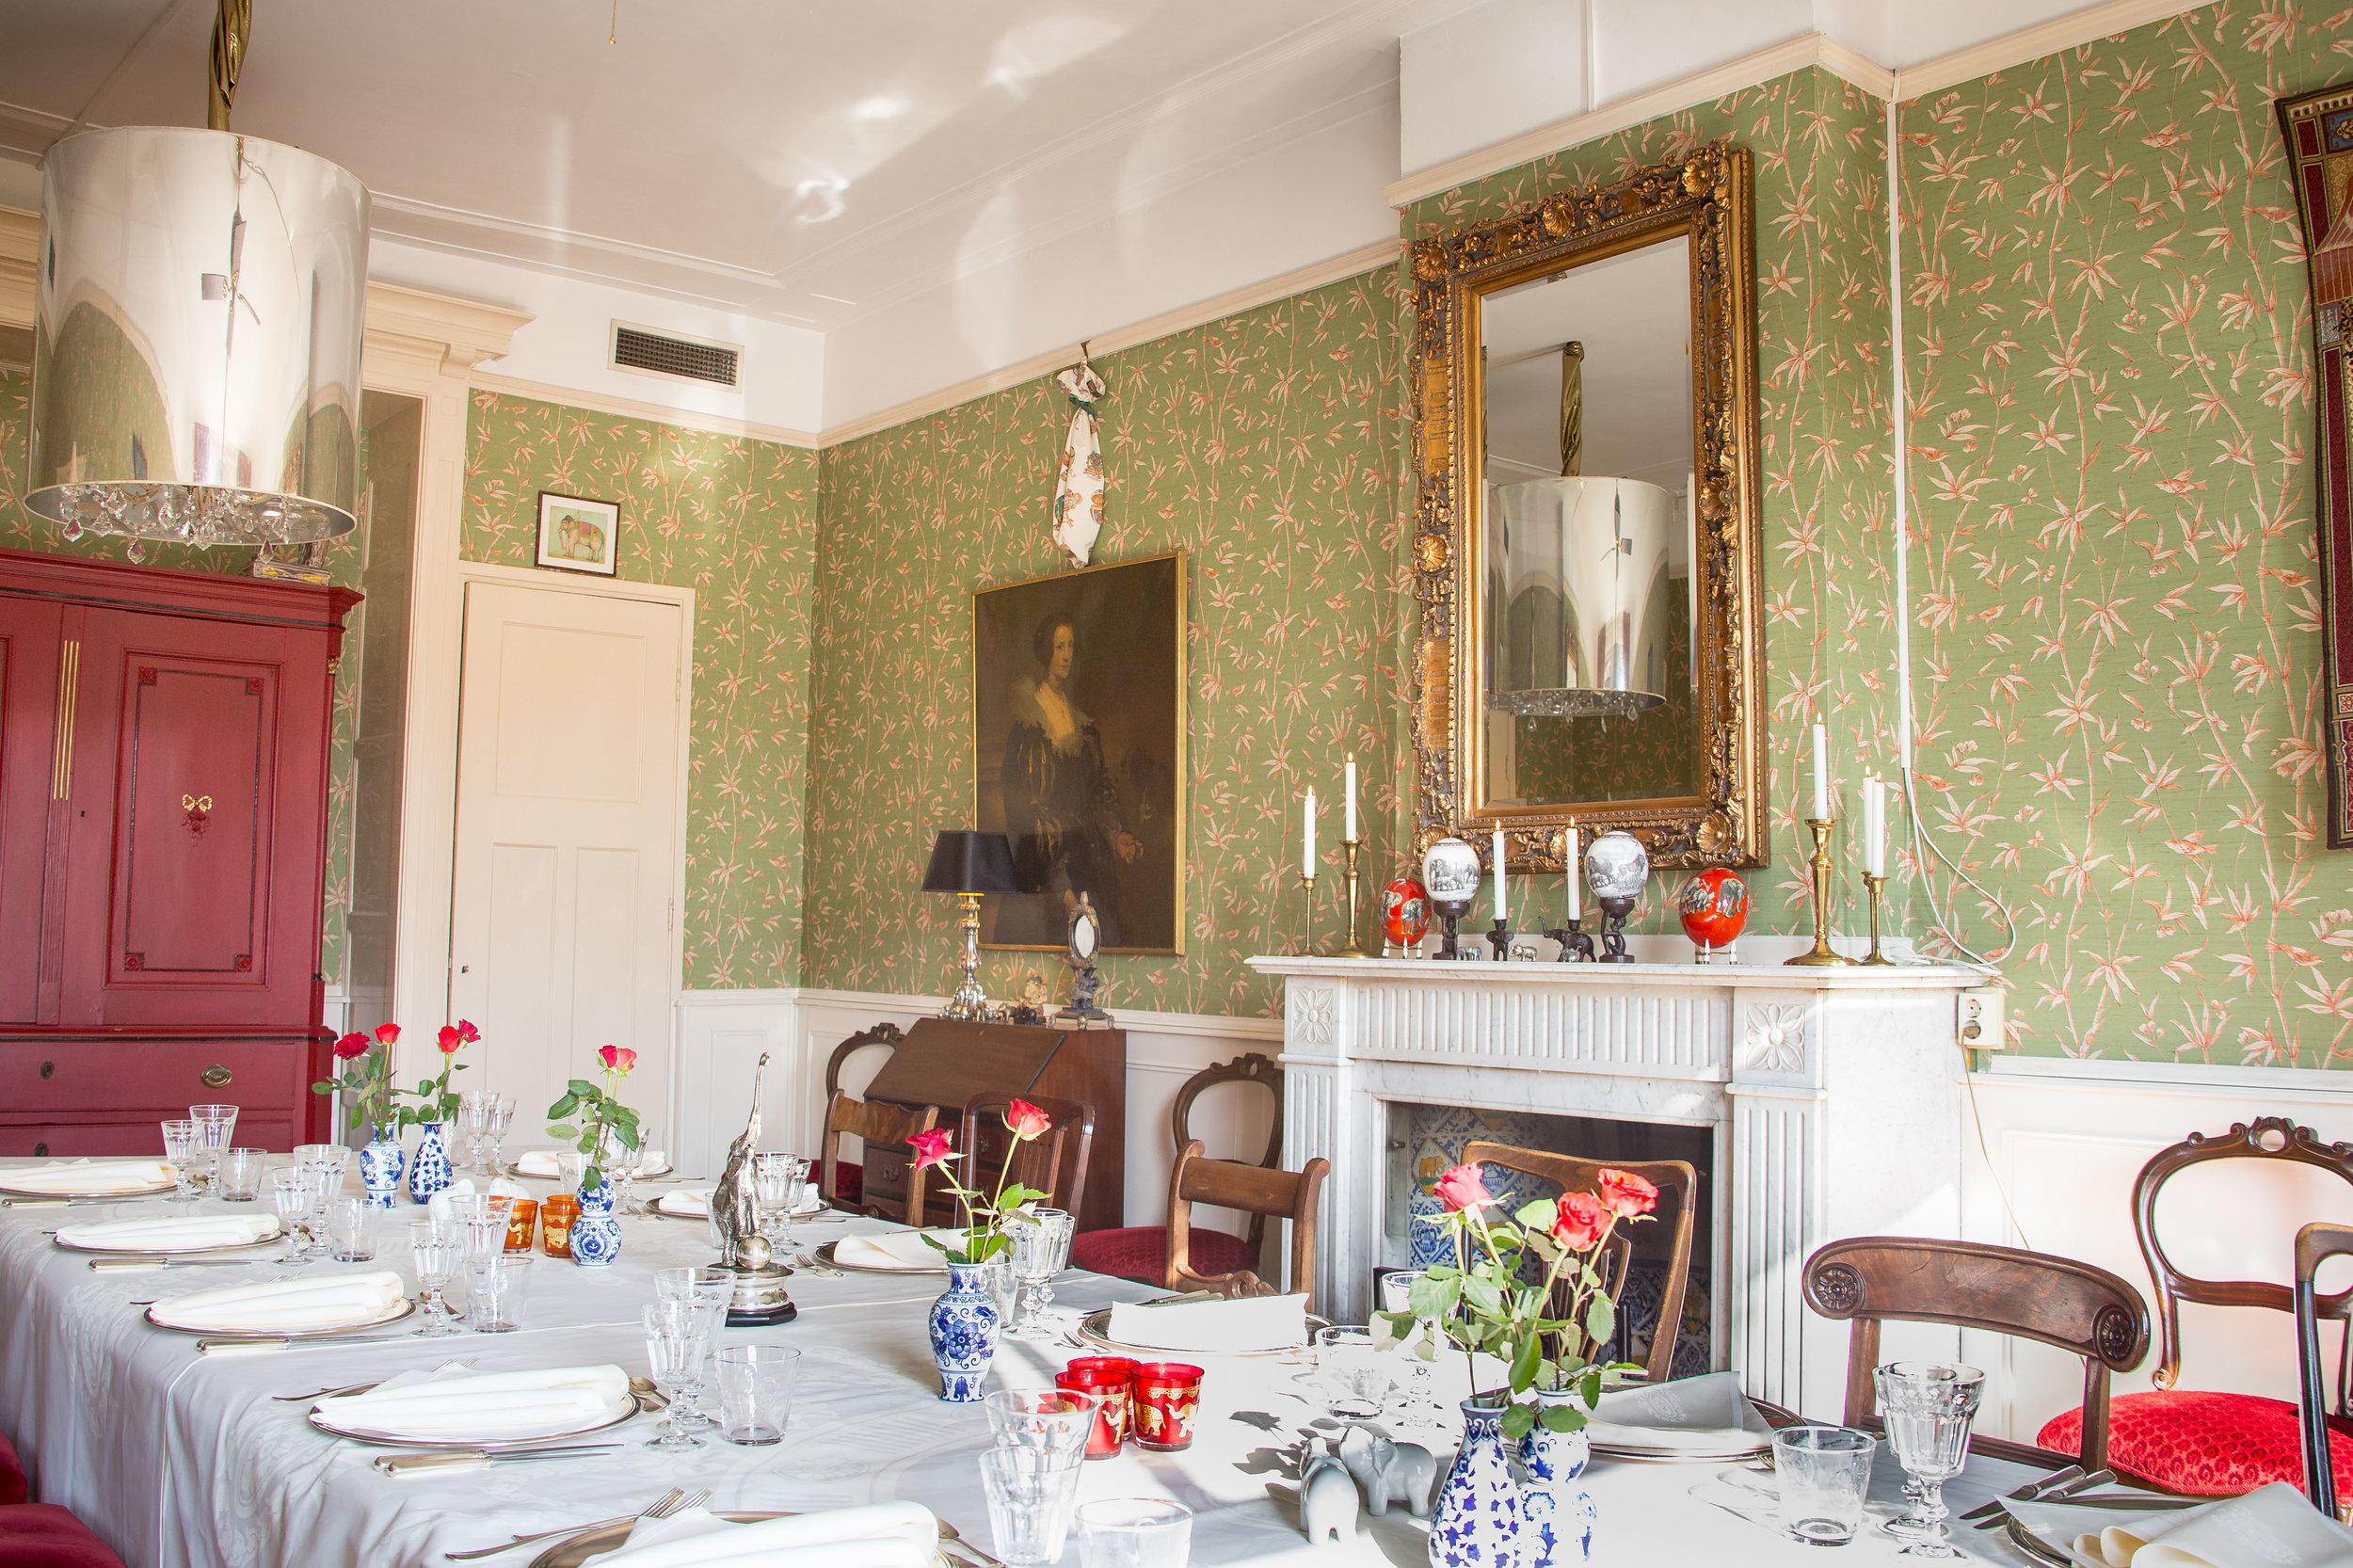 Diner Thuis-5.jpg